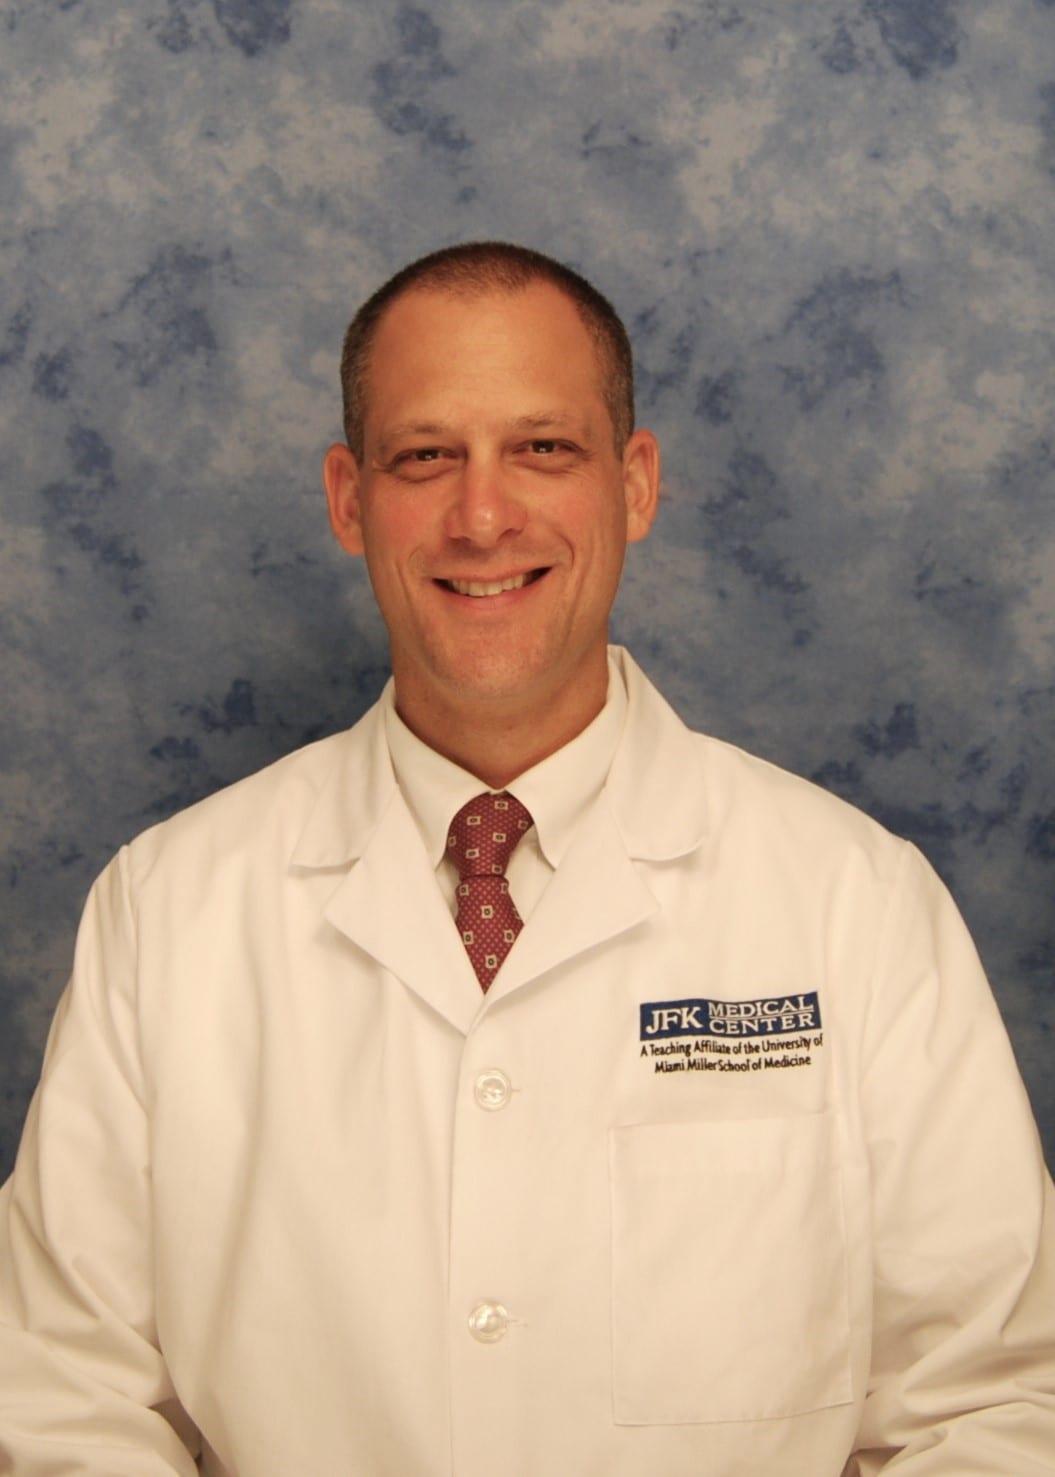 Maricarmen Quintero, Arthritis & Rheumatology Associates